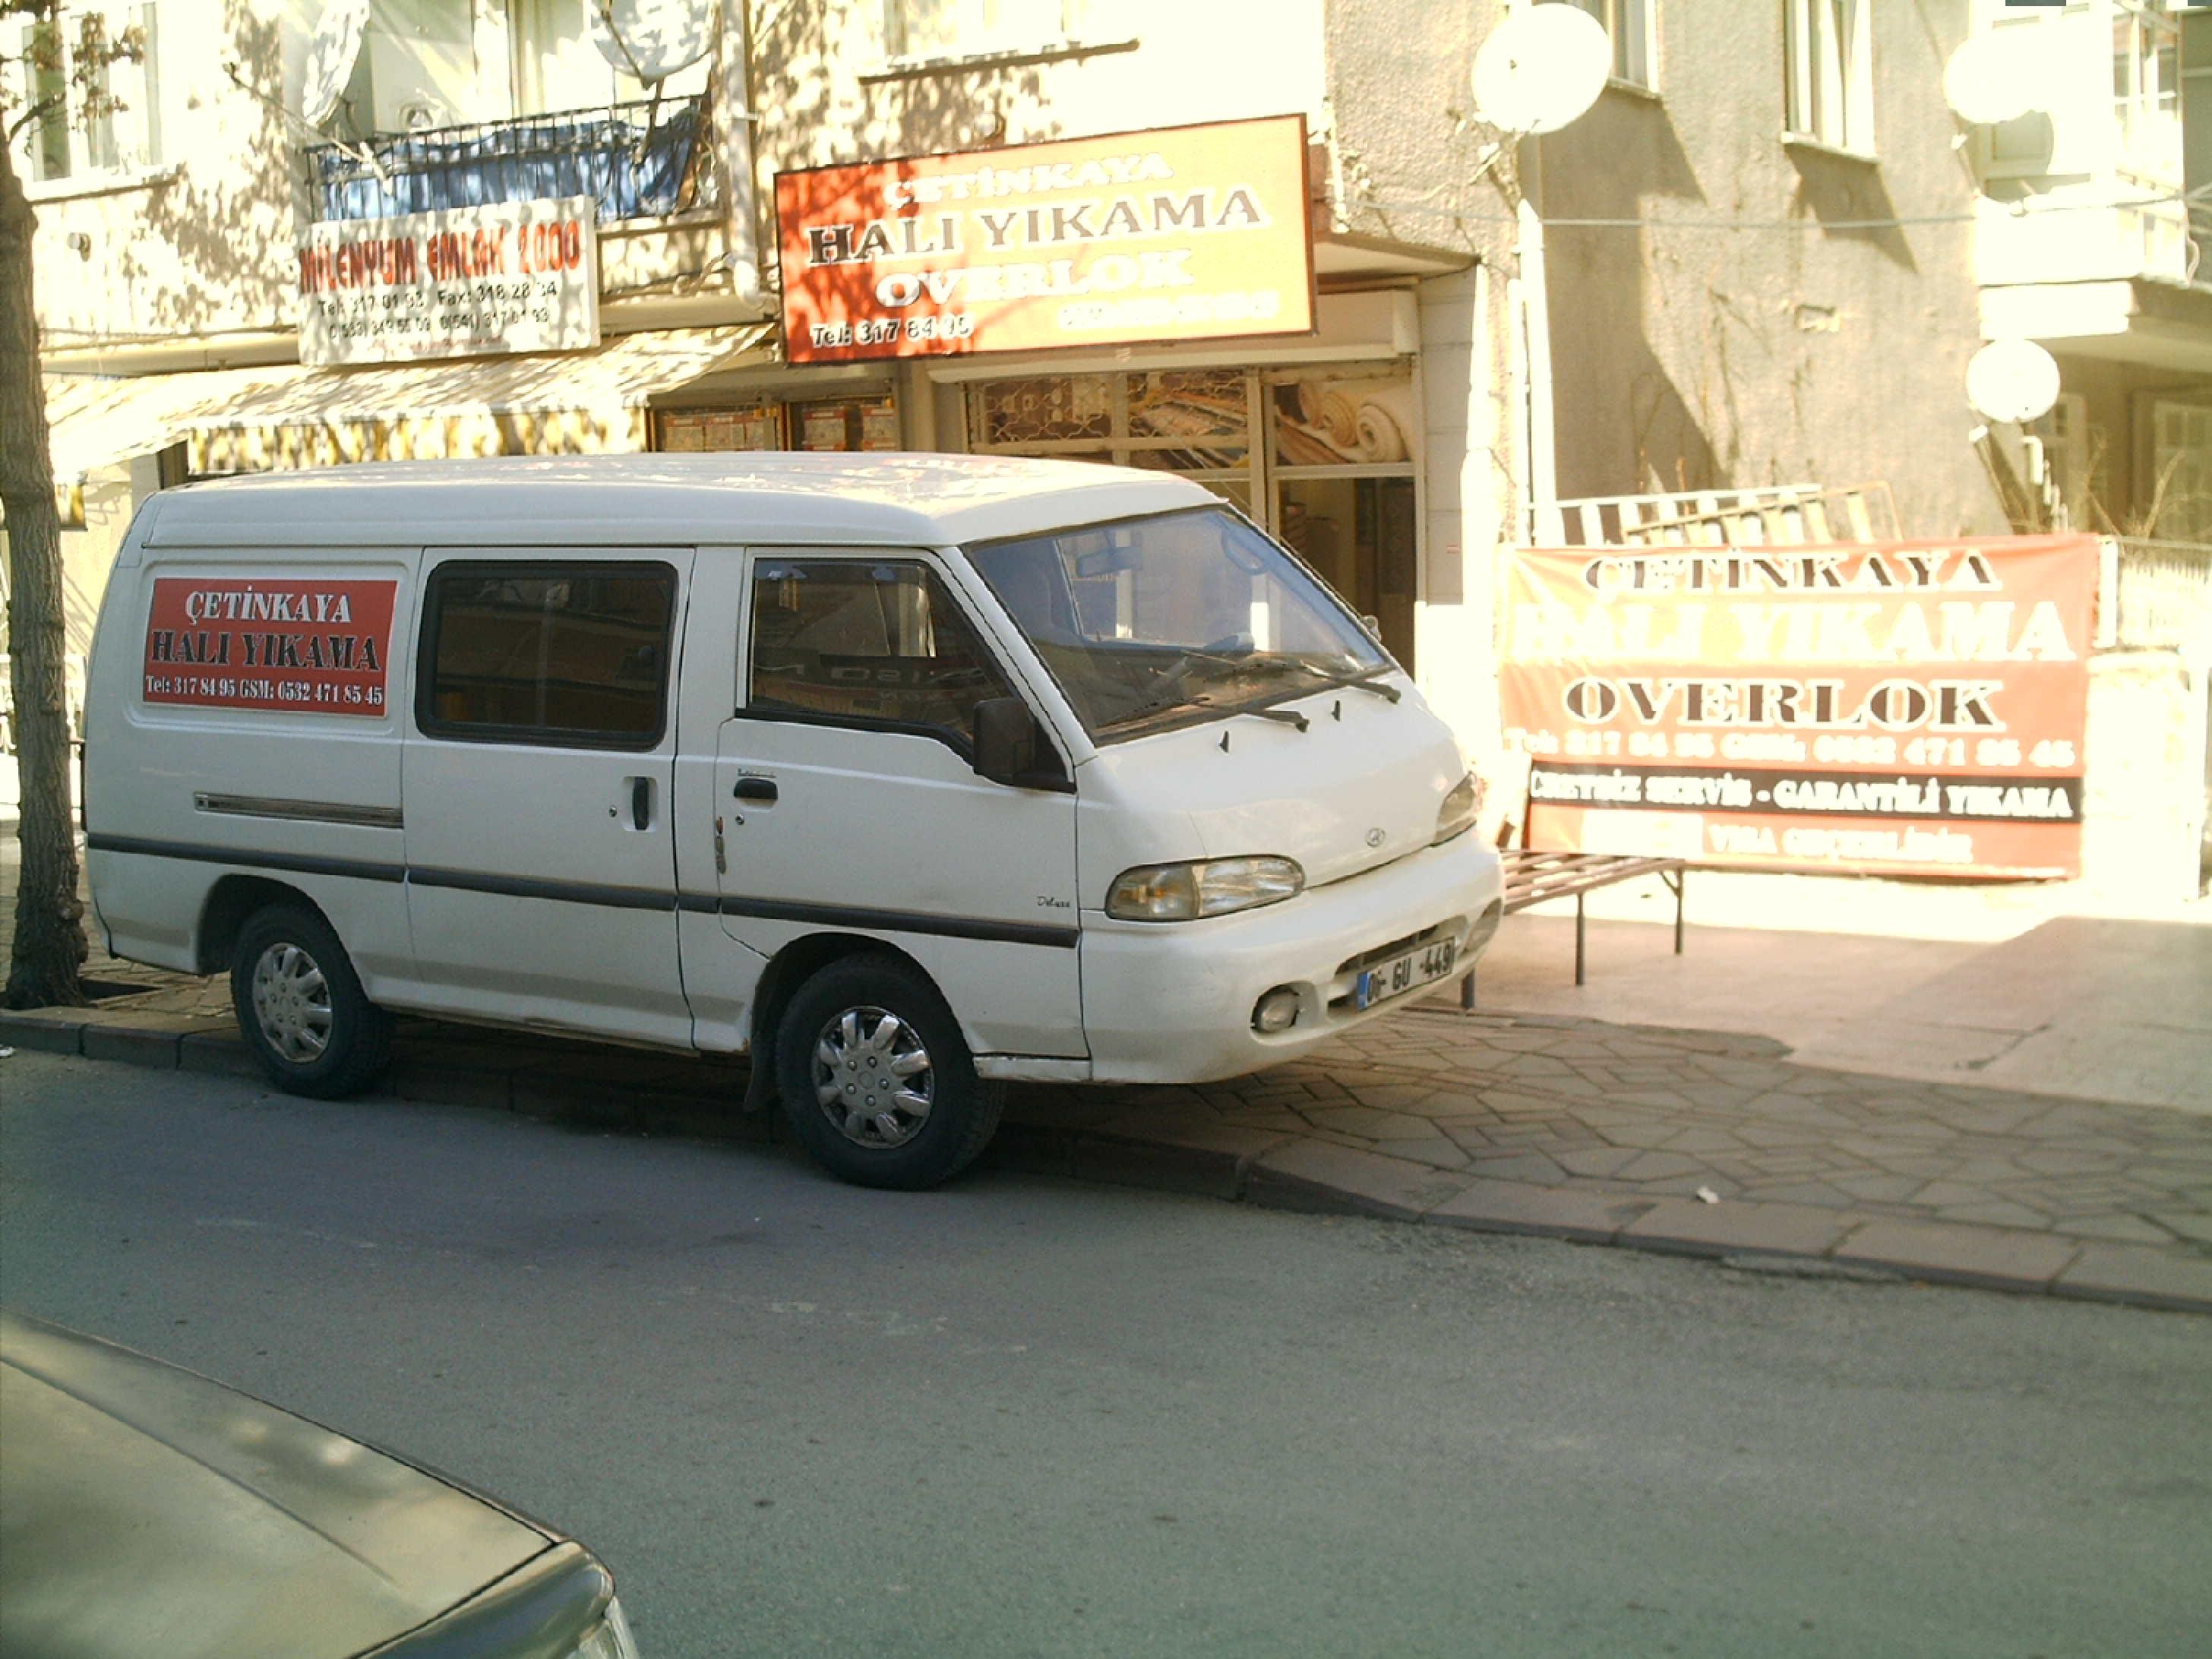 tepealtı_hali_yikama_servis